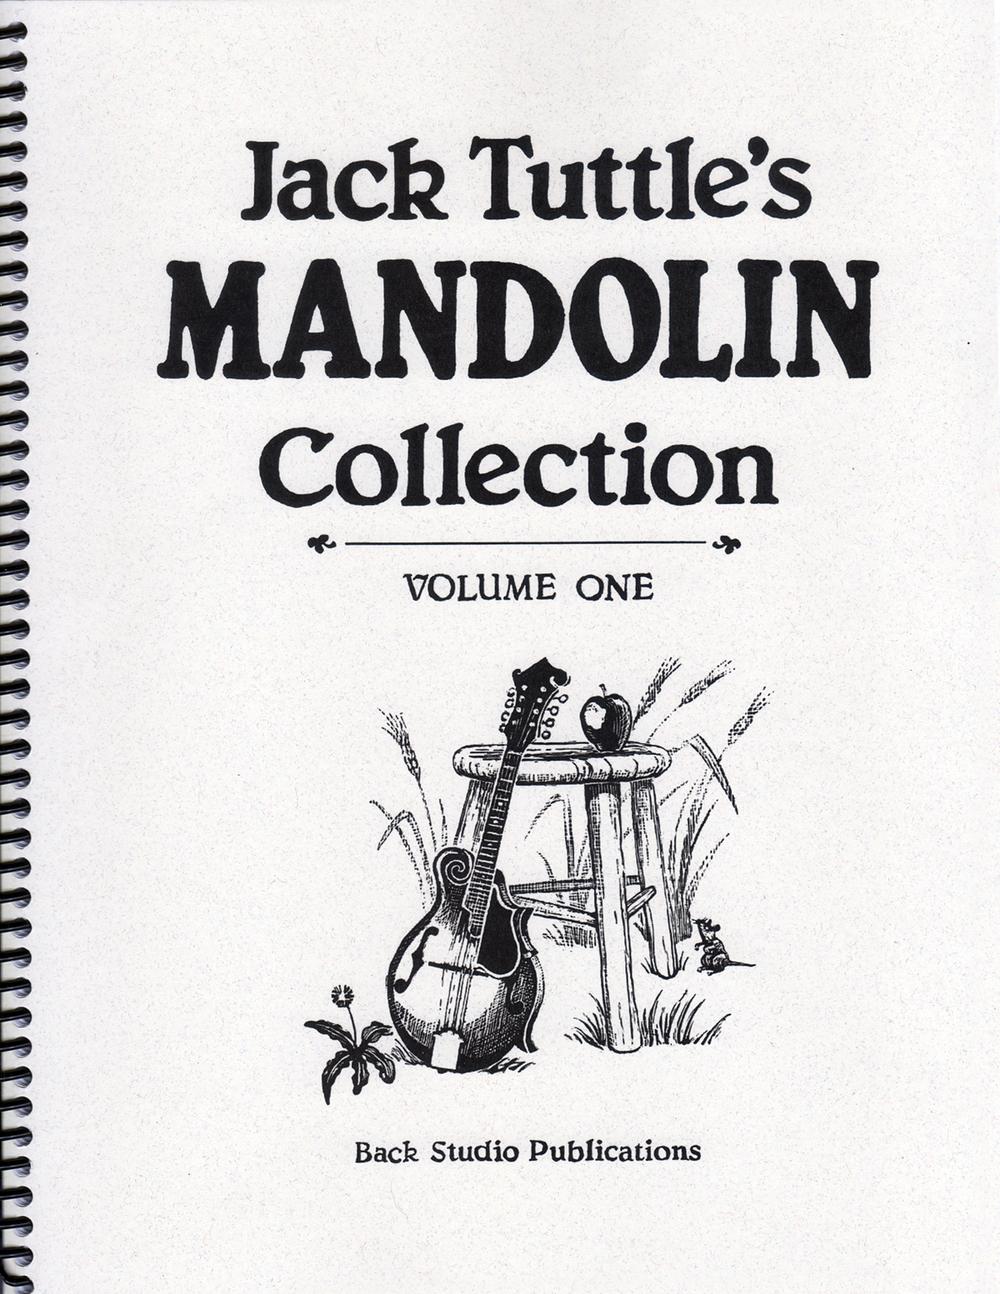 Jack Tuttle's Mandolin Collection, Vol. 1